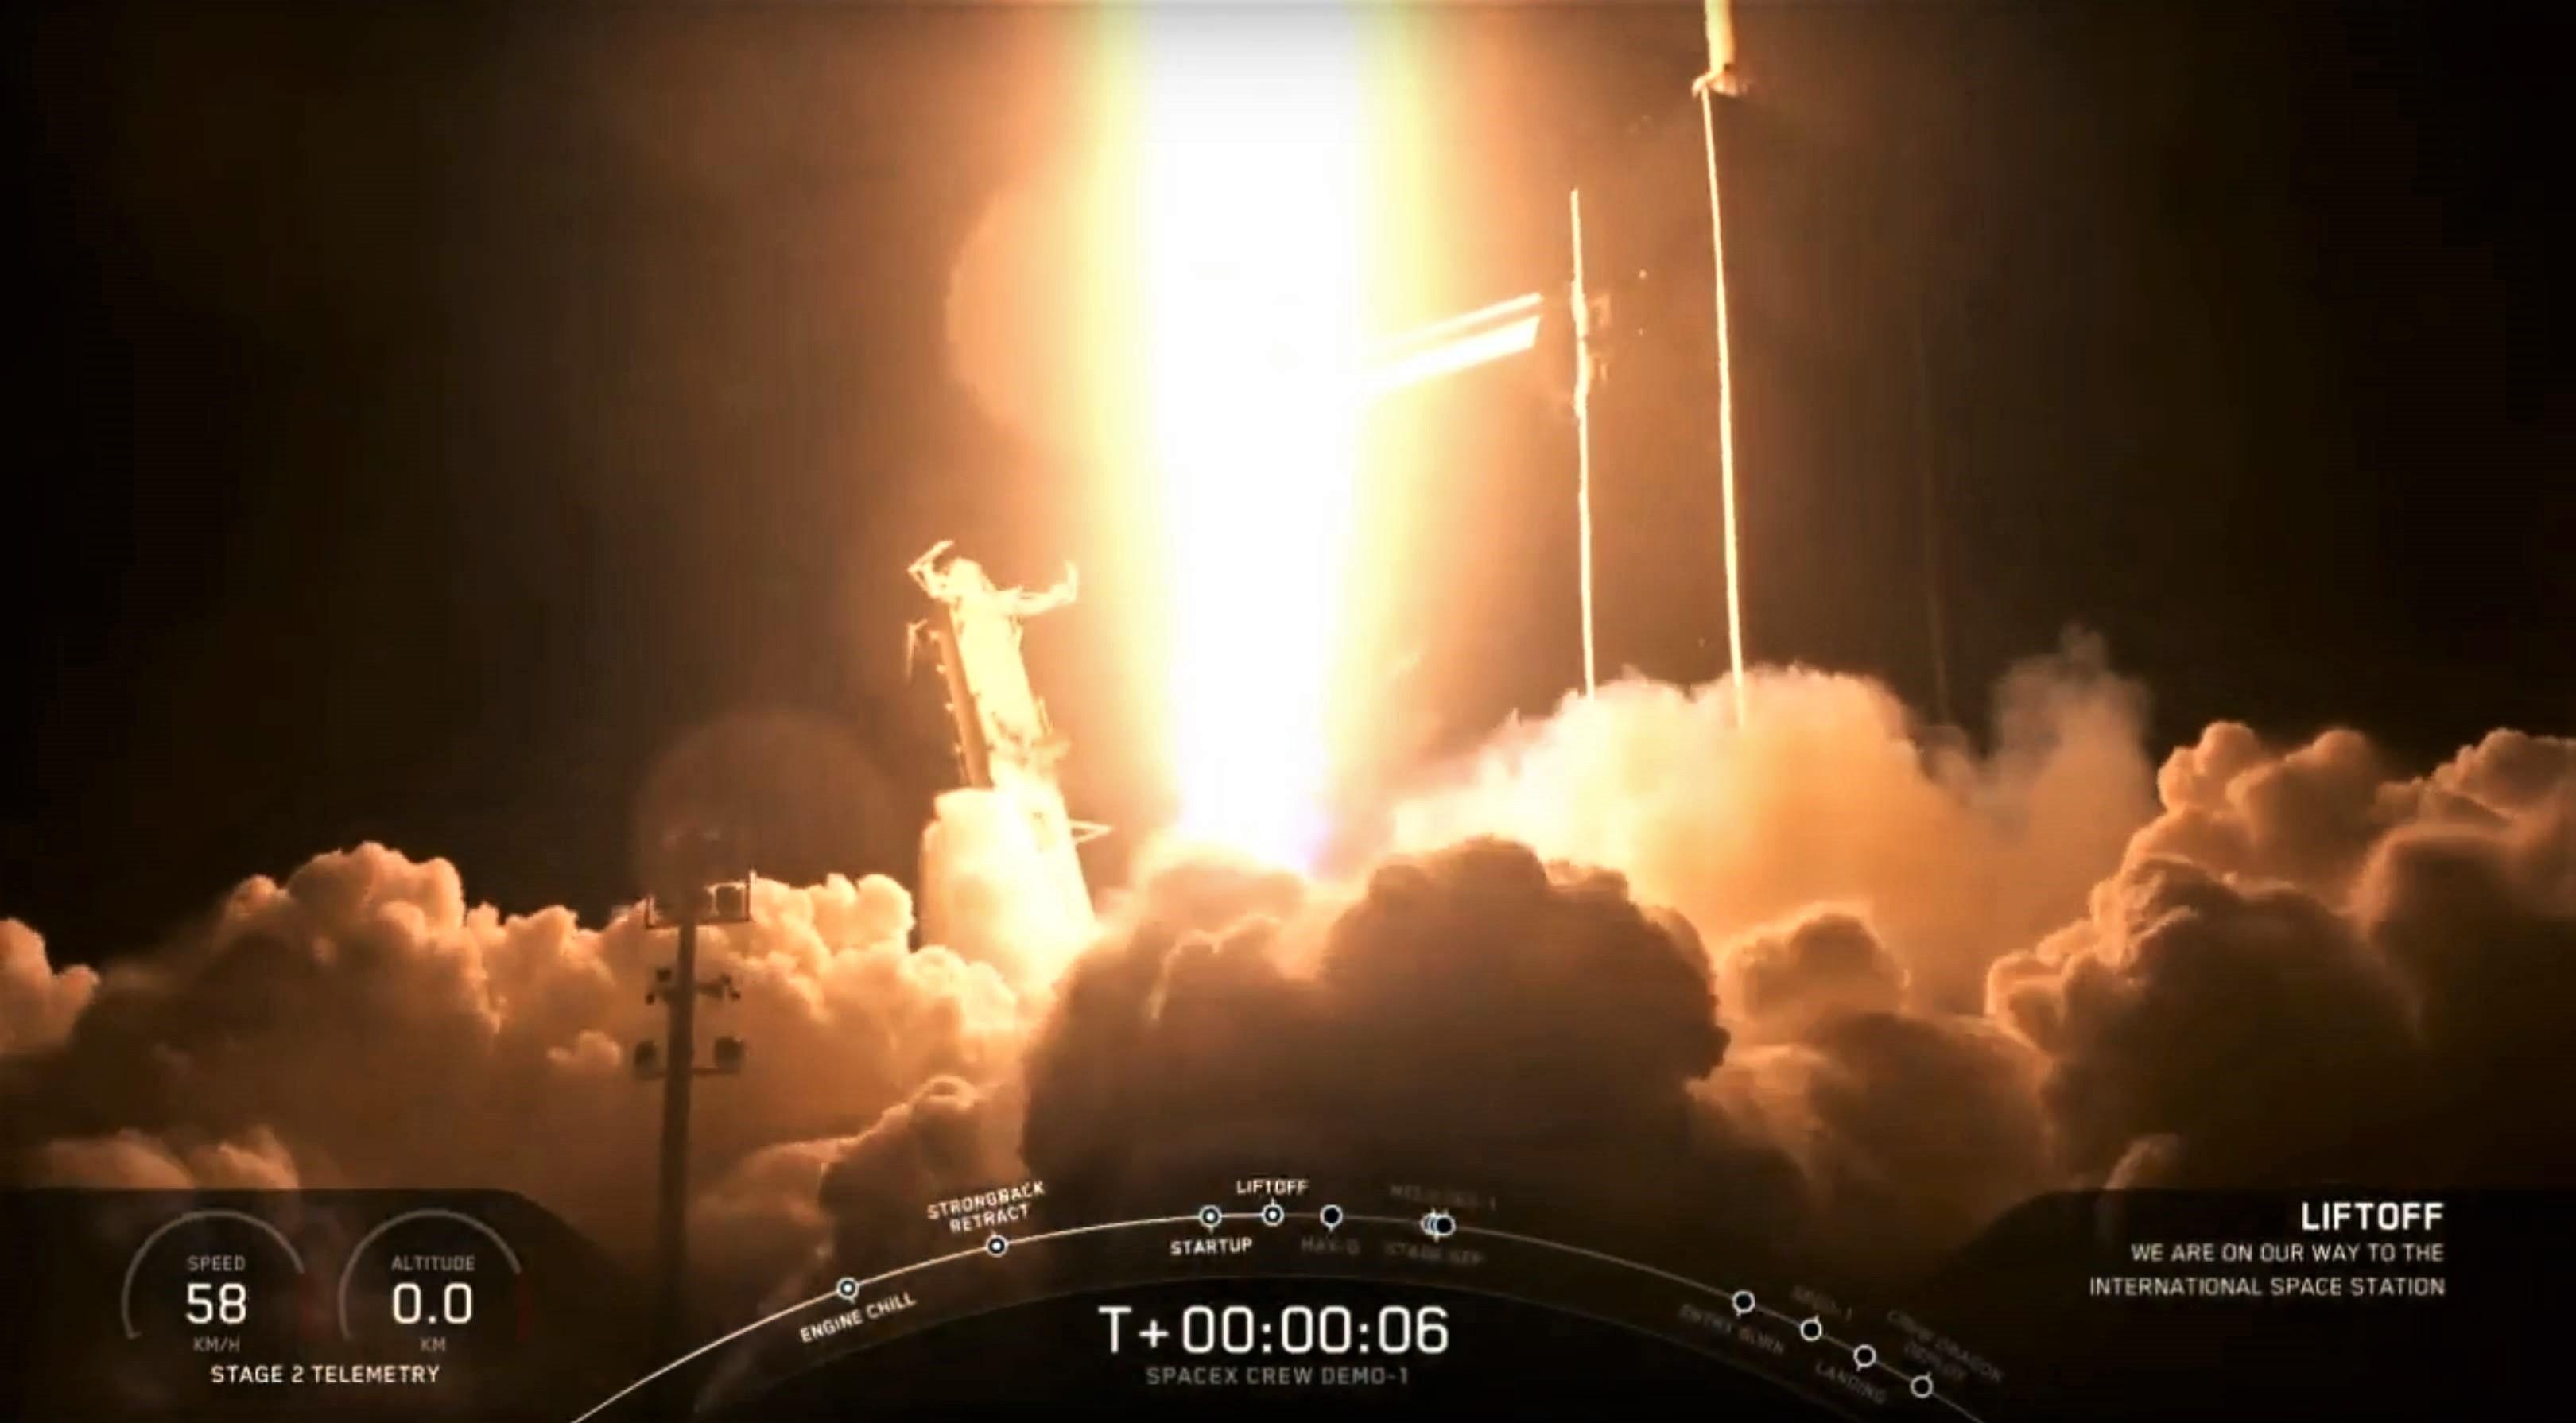 DM-1 Crew Dragon Falcon 9 B1051 launch (SpaceX) webcast 3